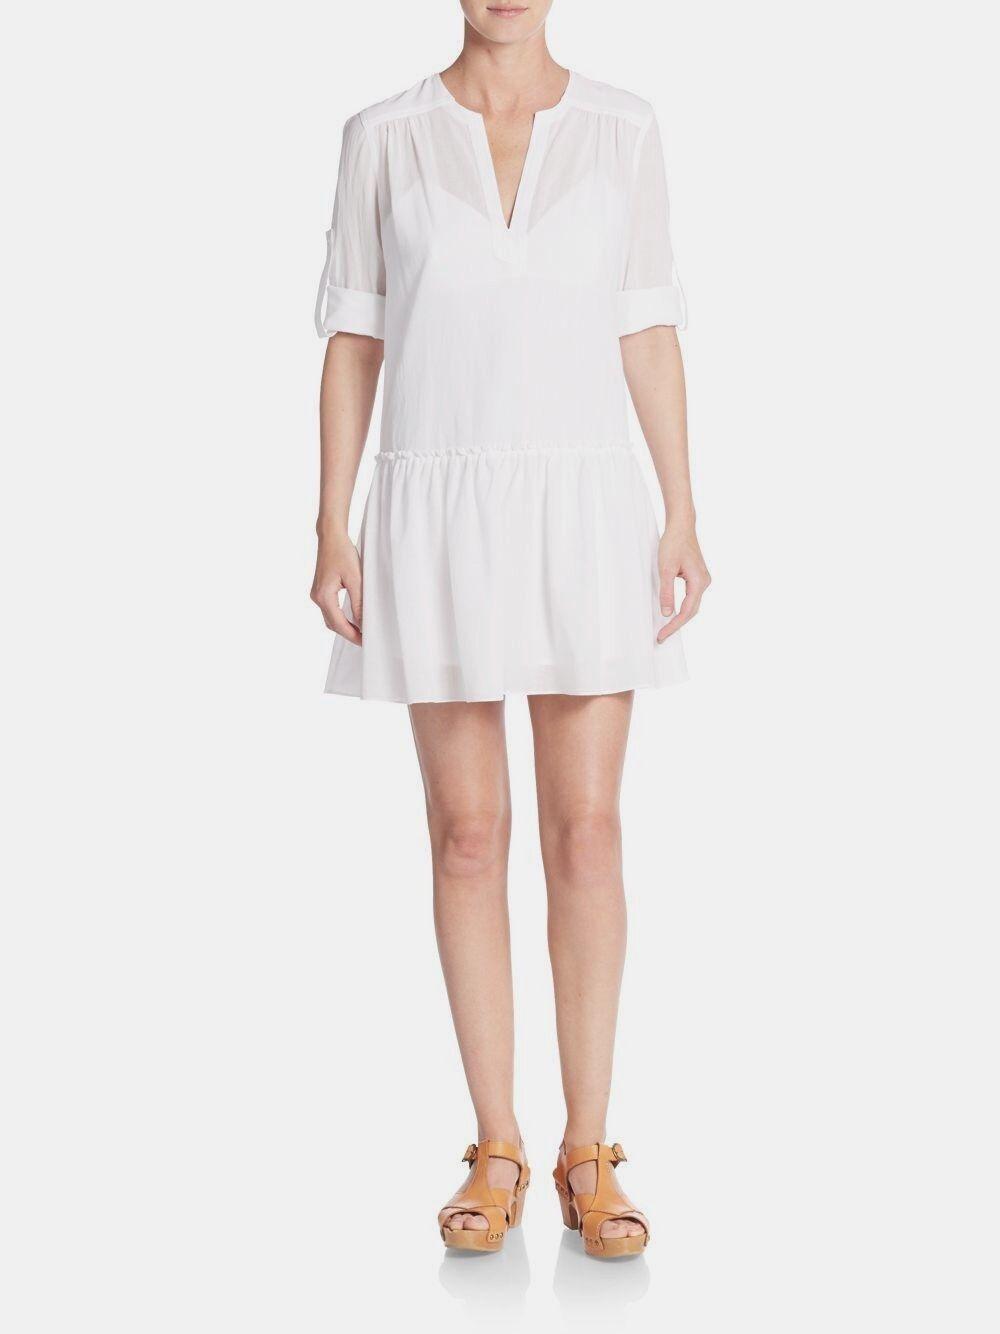 NWT Bcbg maxazria White Cotton Gauze Peasant bohemian Dress, size 6, Msrp 198.00